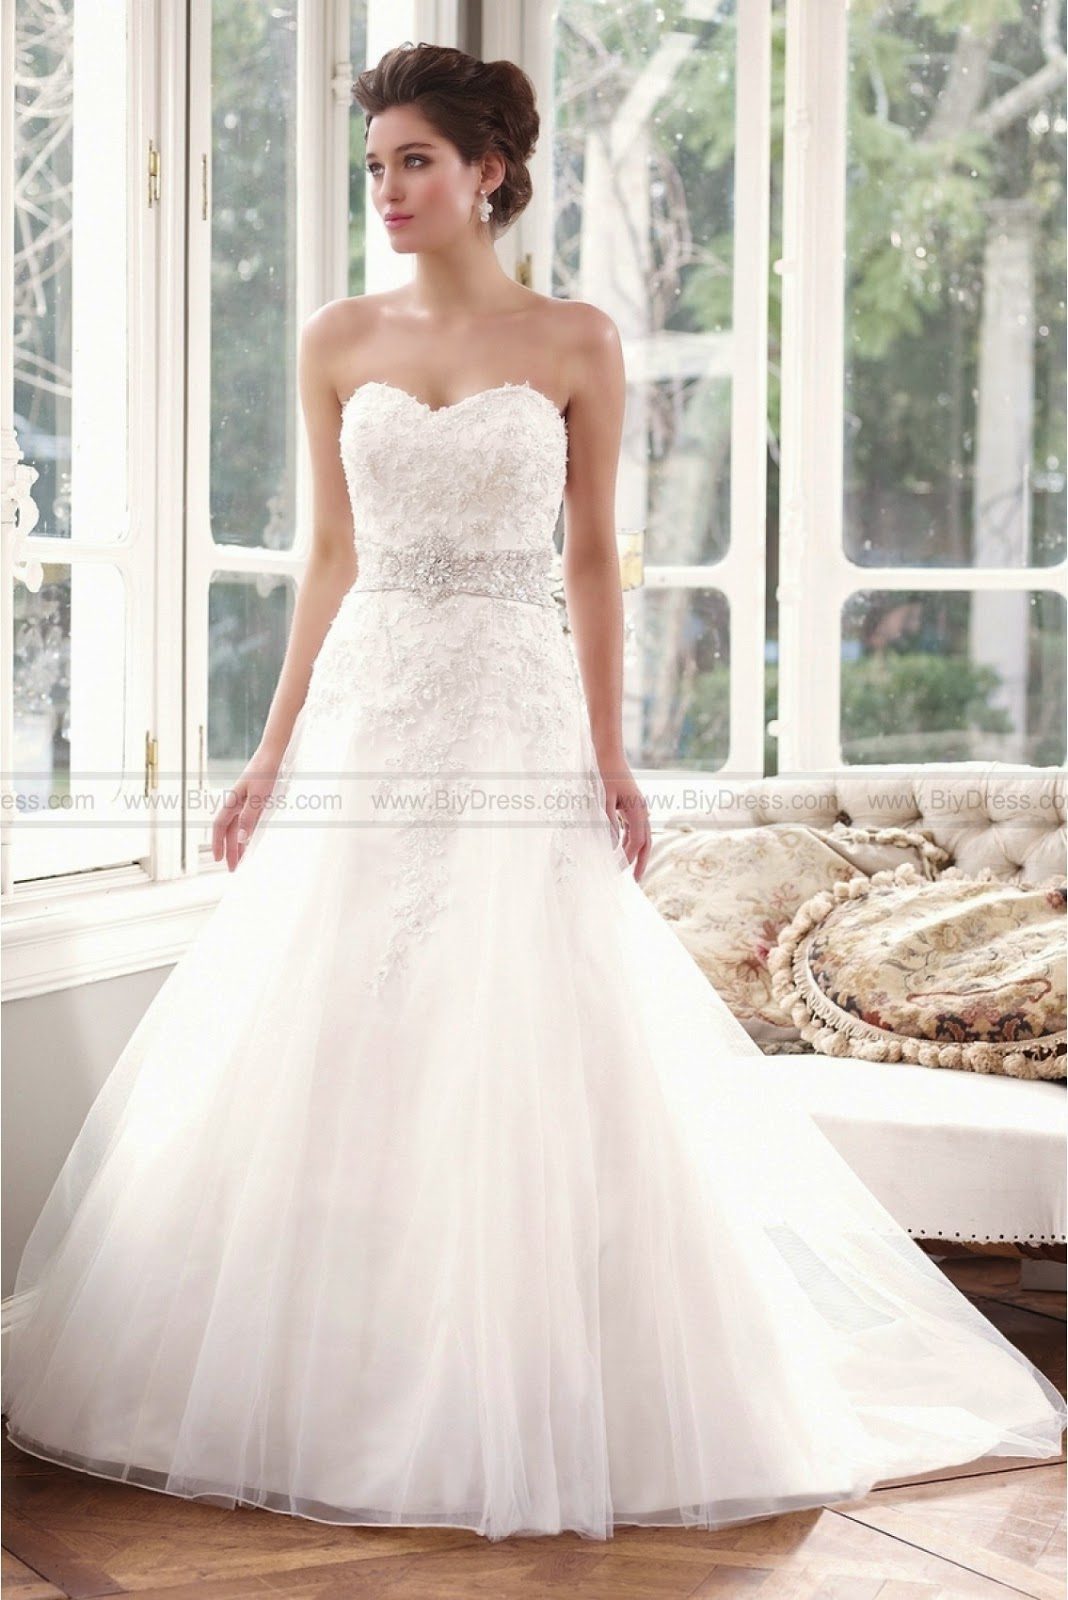 Blog Archives - 2016 wedding dresses